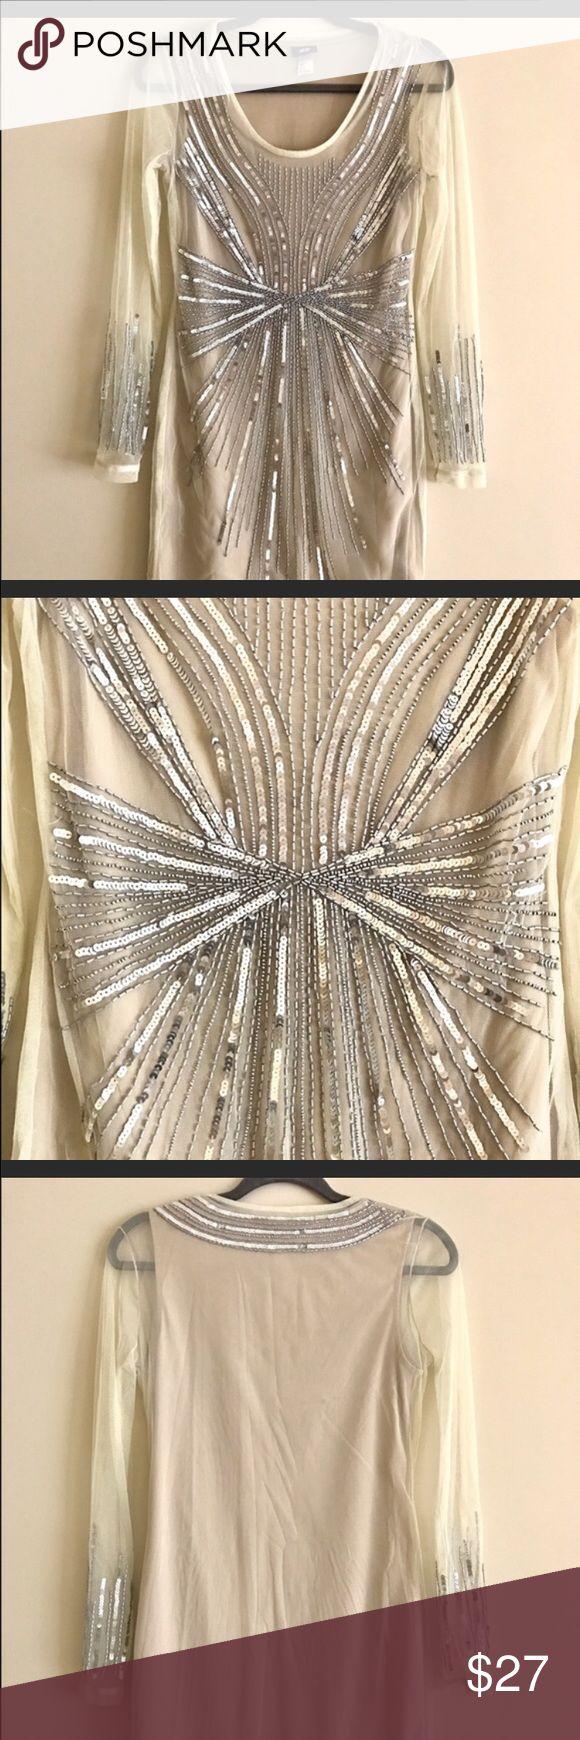 H&m cream sequin dress size small H&m cream sequin dress size small. A few missing sequins on sleeve see photo   30' long H&M Dresses